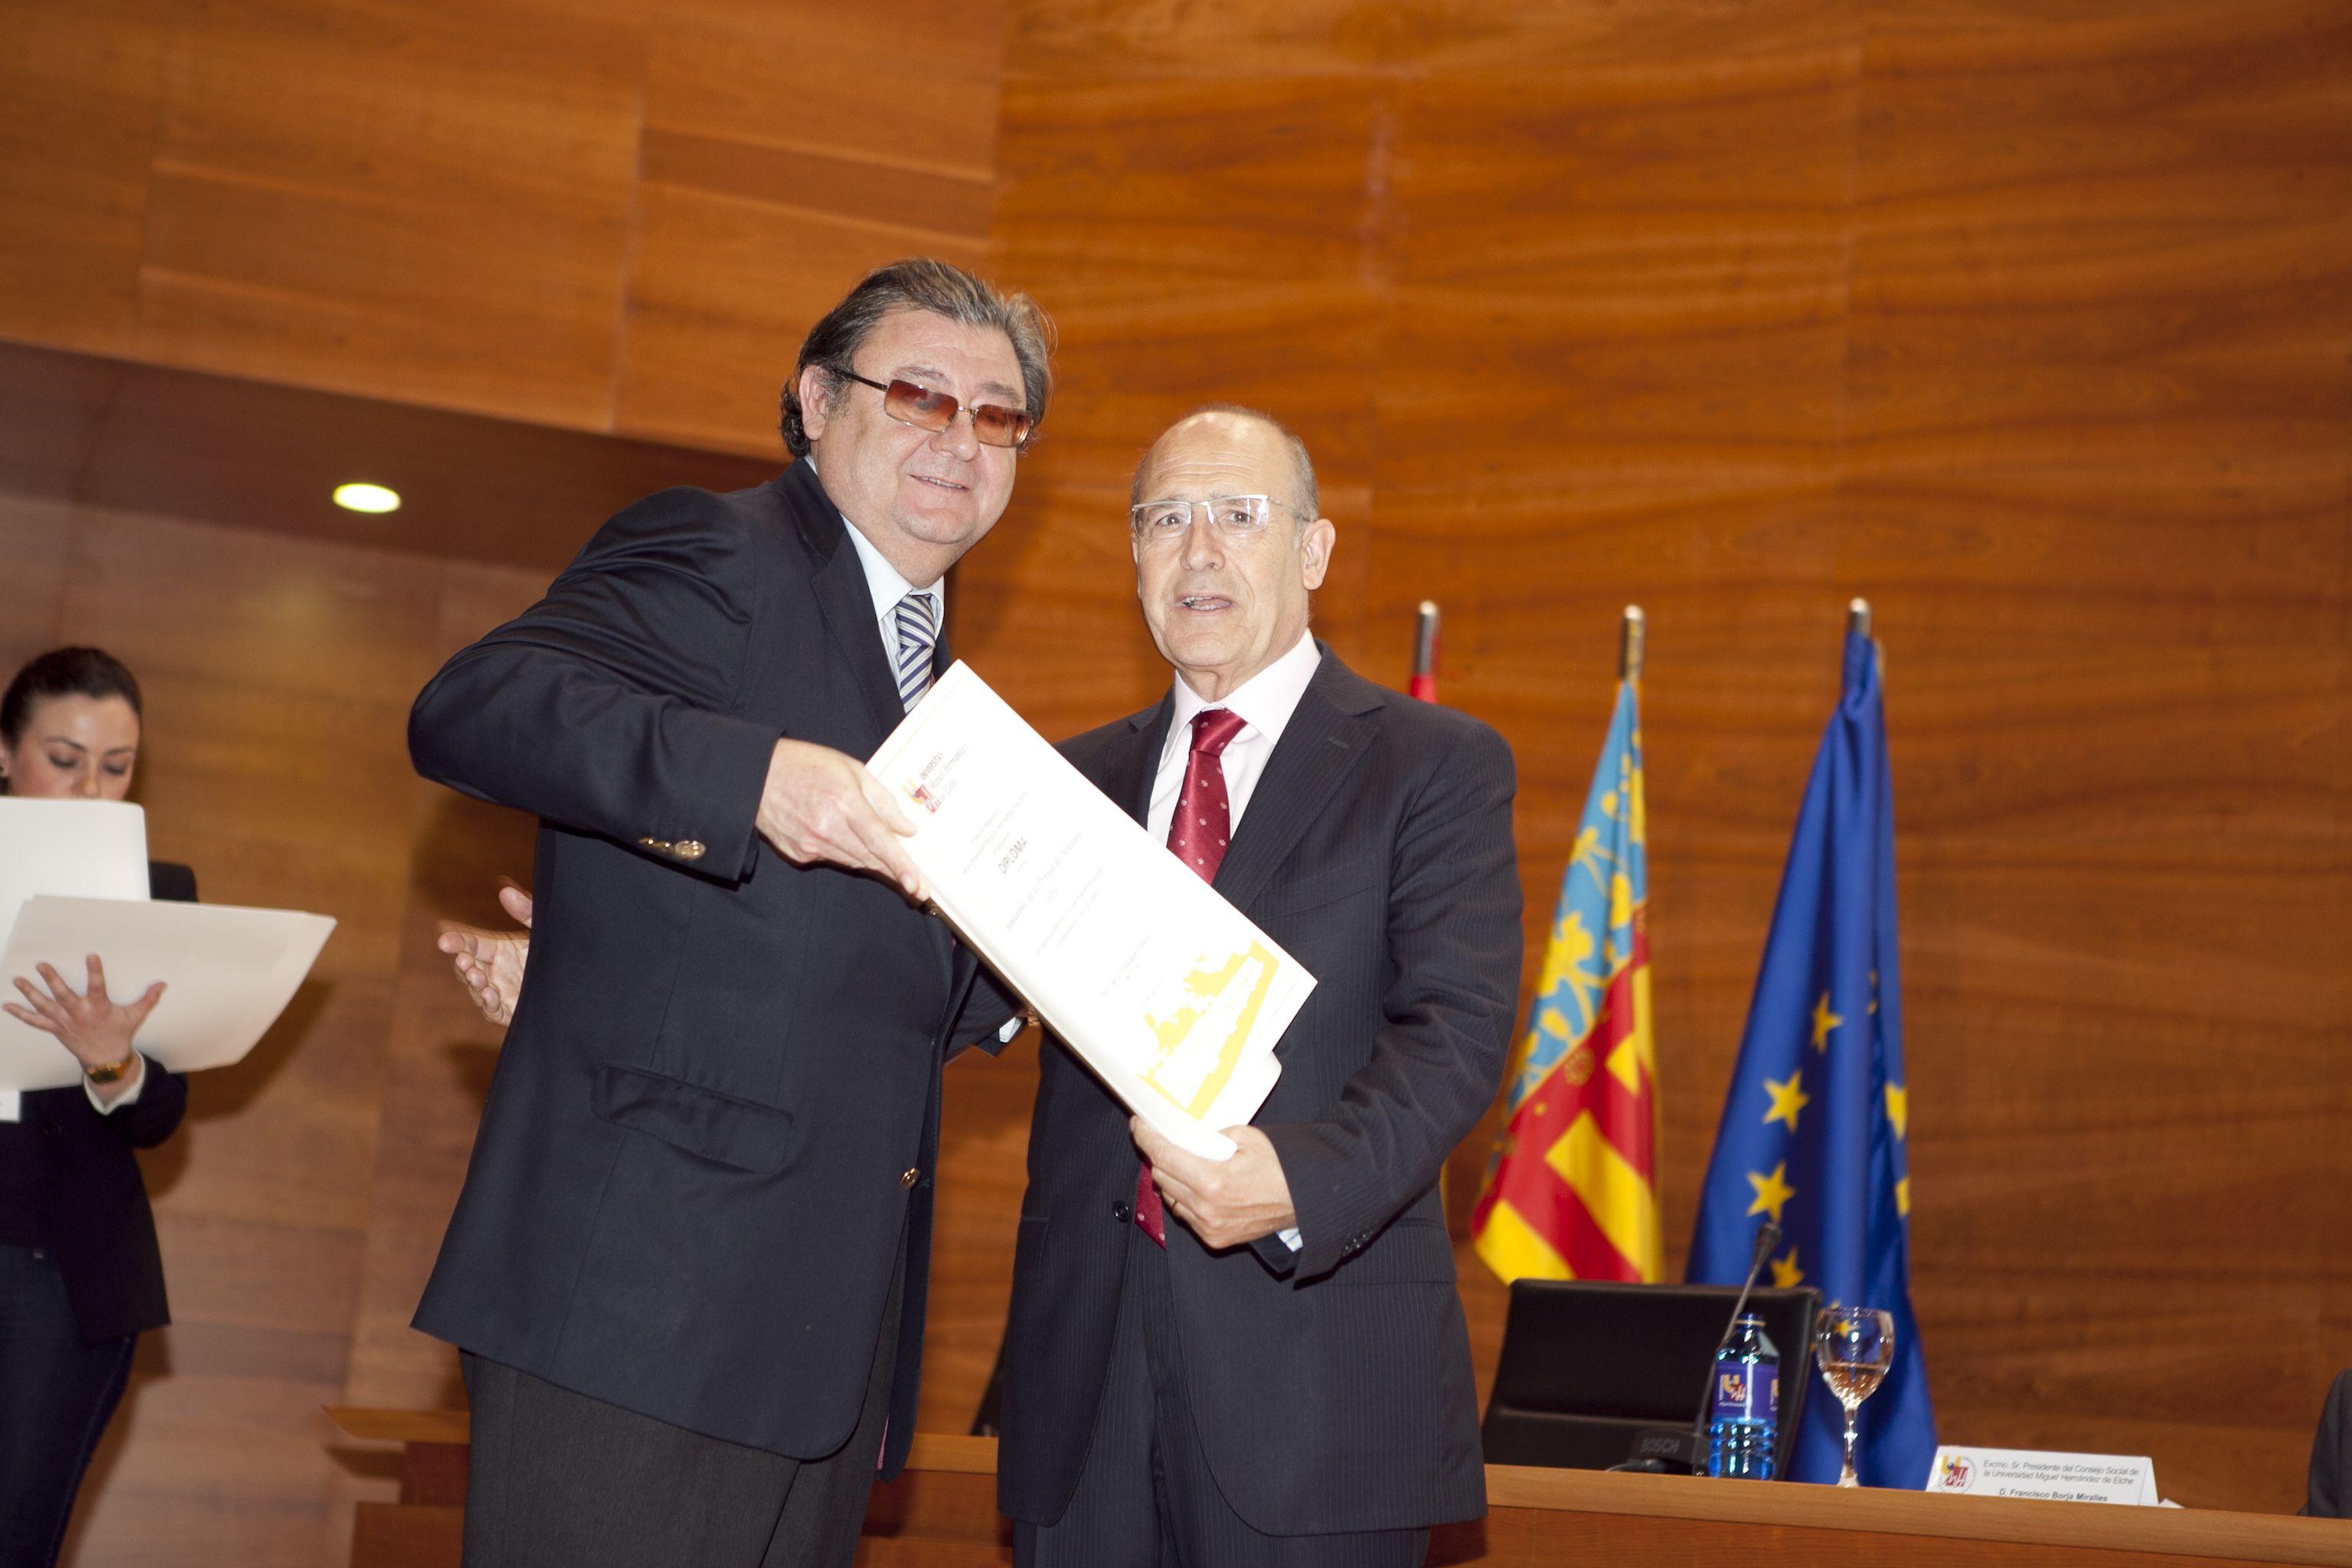 umh-diplomas-rector_mg_6853.jpg